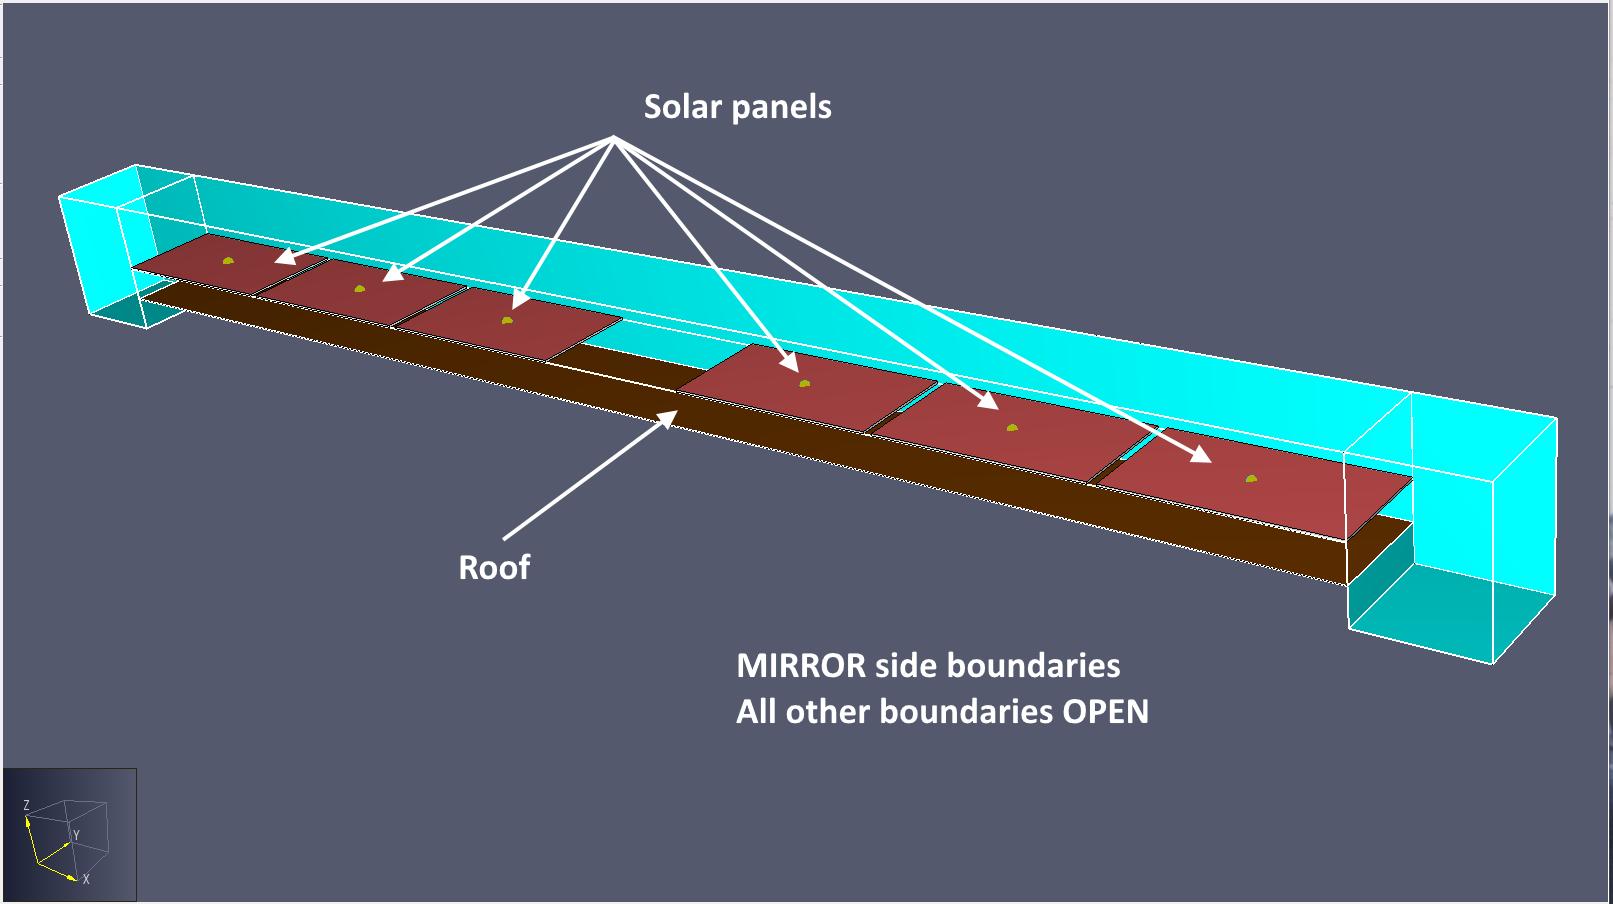 pyro scrn solar panel central gap model